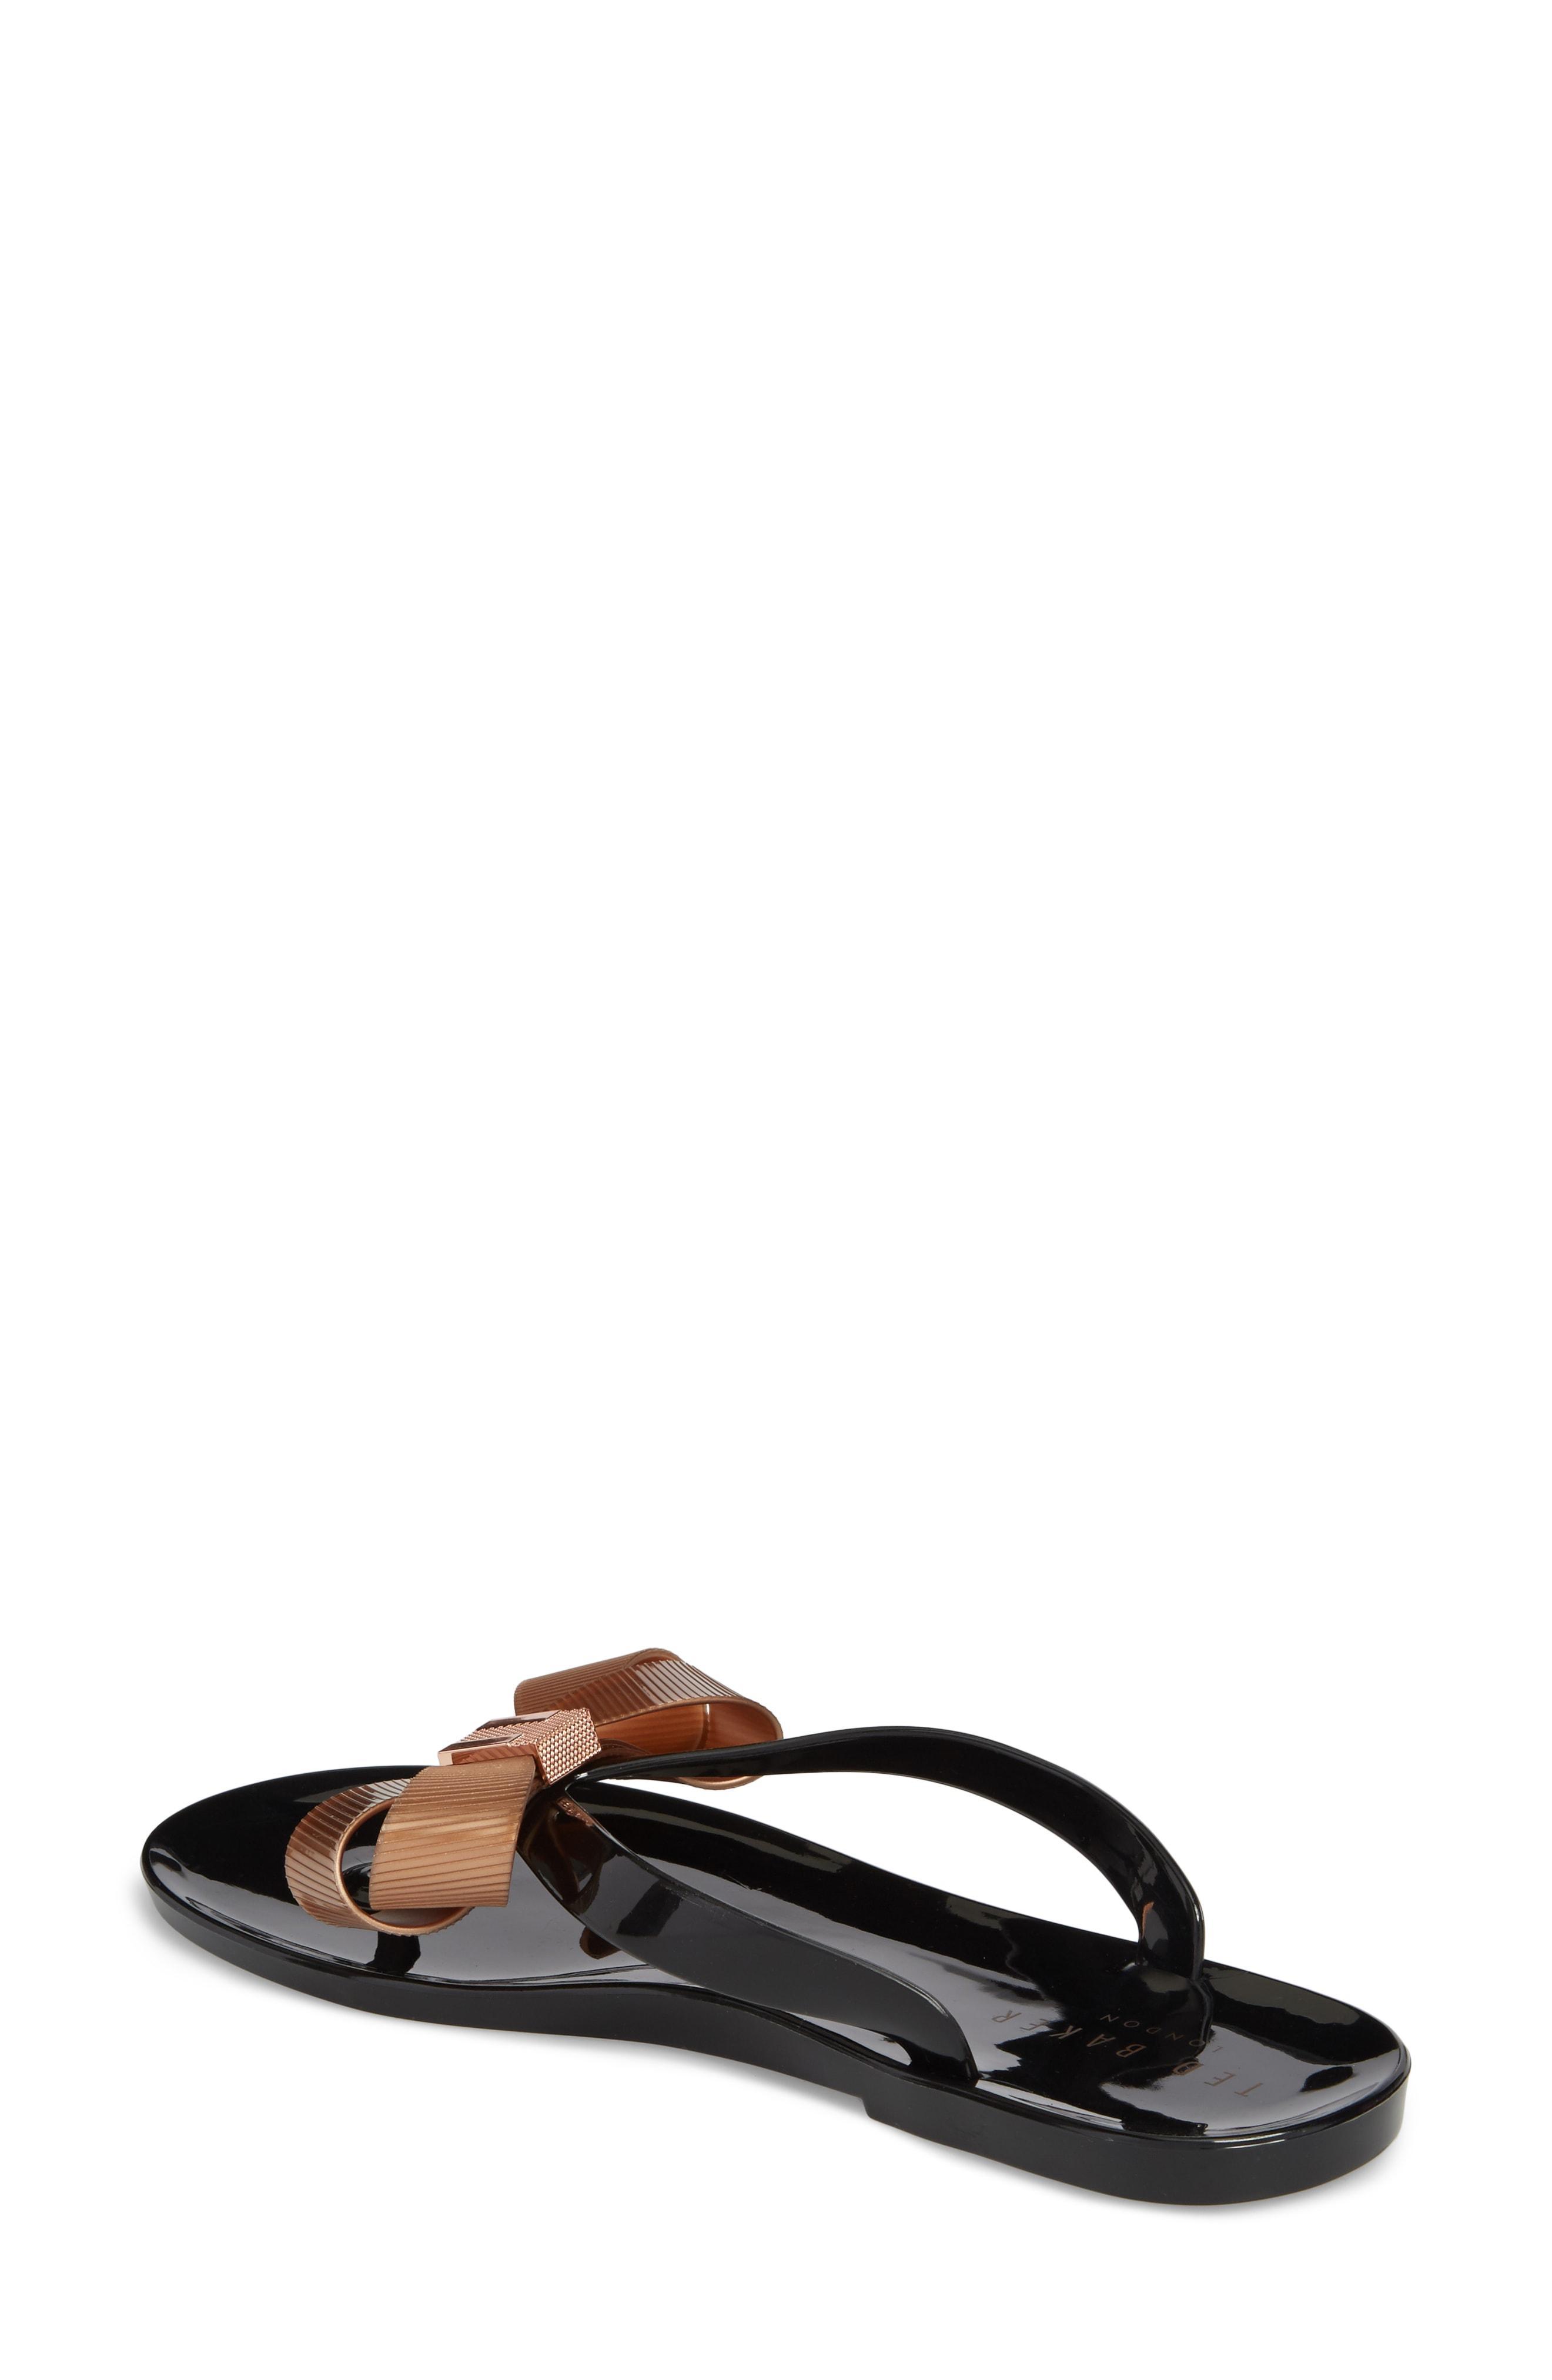 3b7202fc7b92 Ted Baker Camaril Black T-Bar Bow Flat Sandals - Black